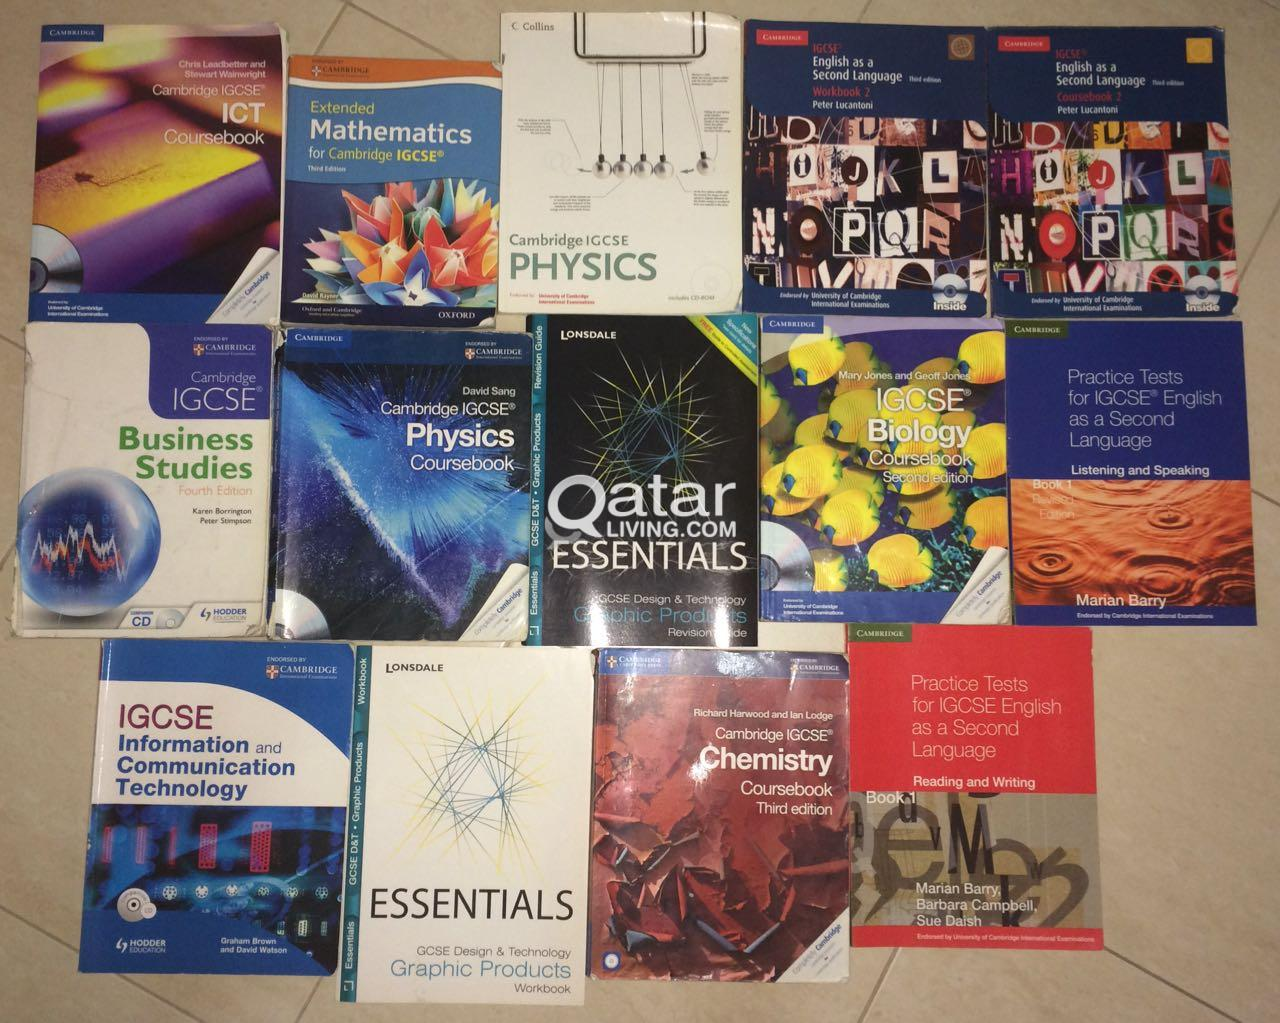 IGCSE & AS level books & pastpapers | Qatar Living